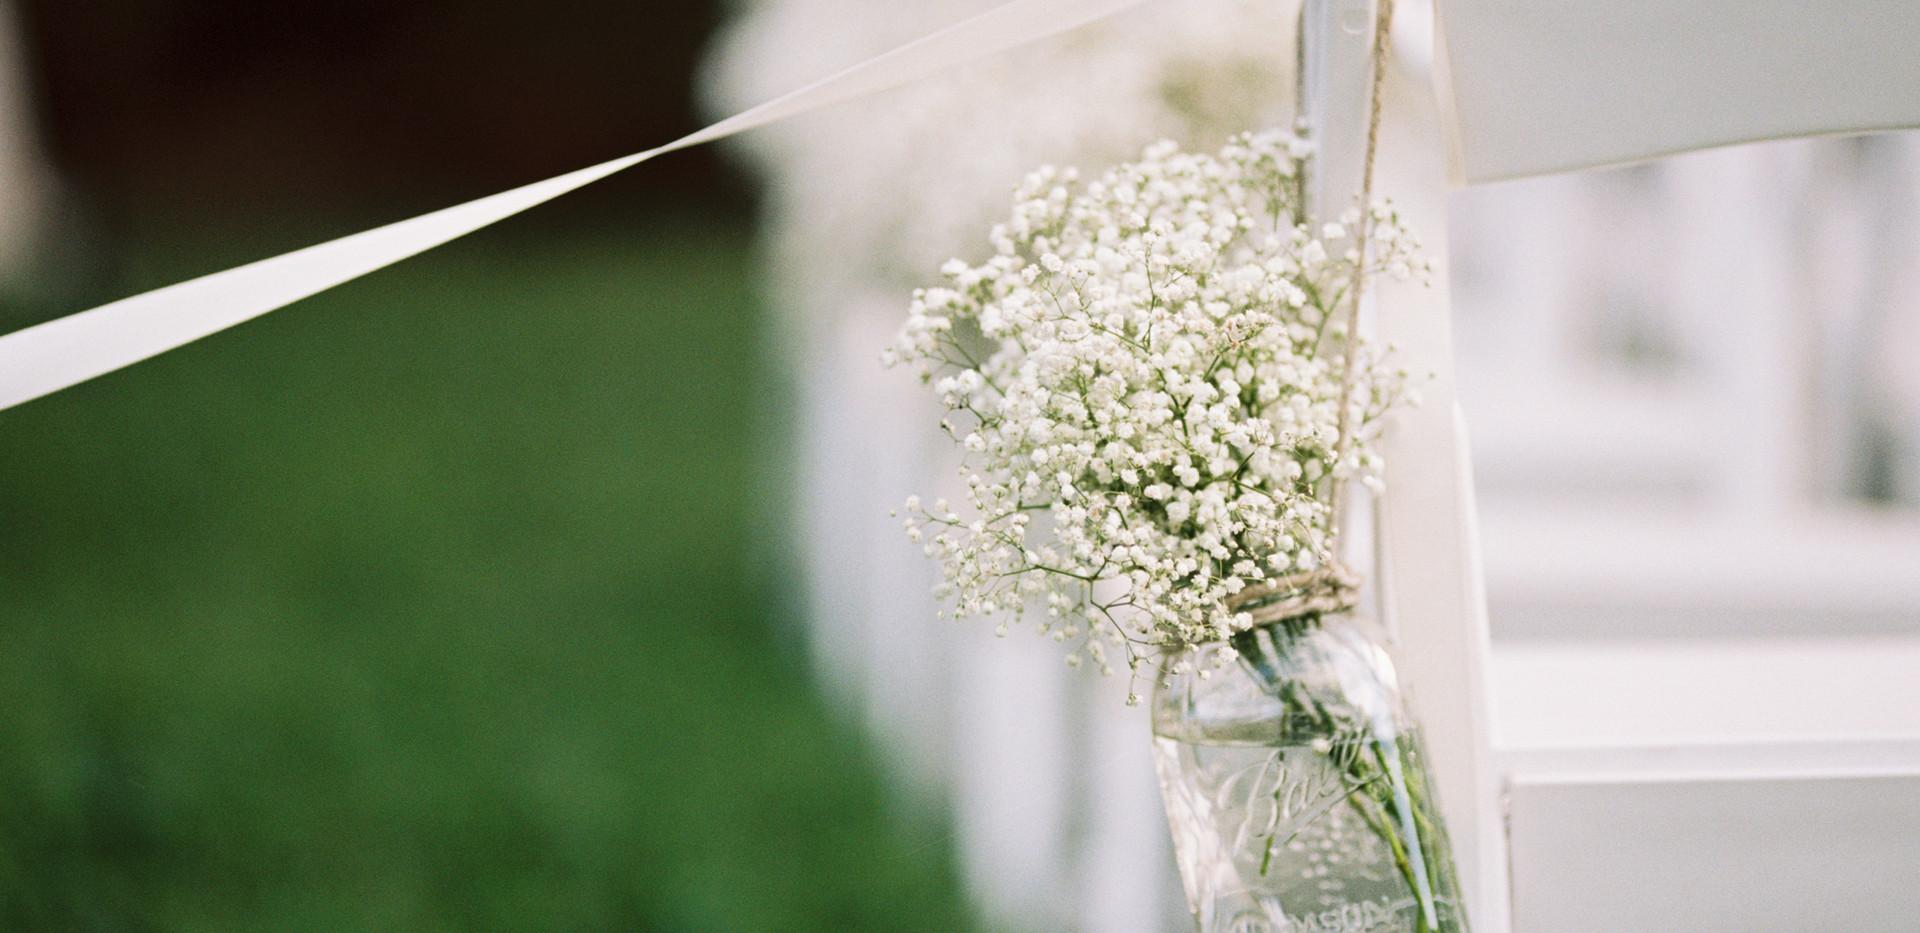 The Wedding Aisle